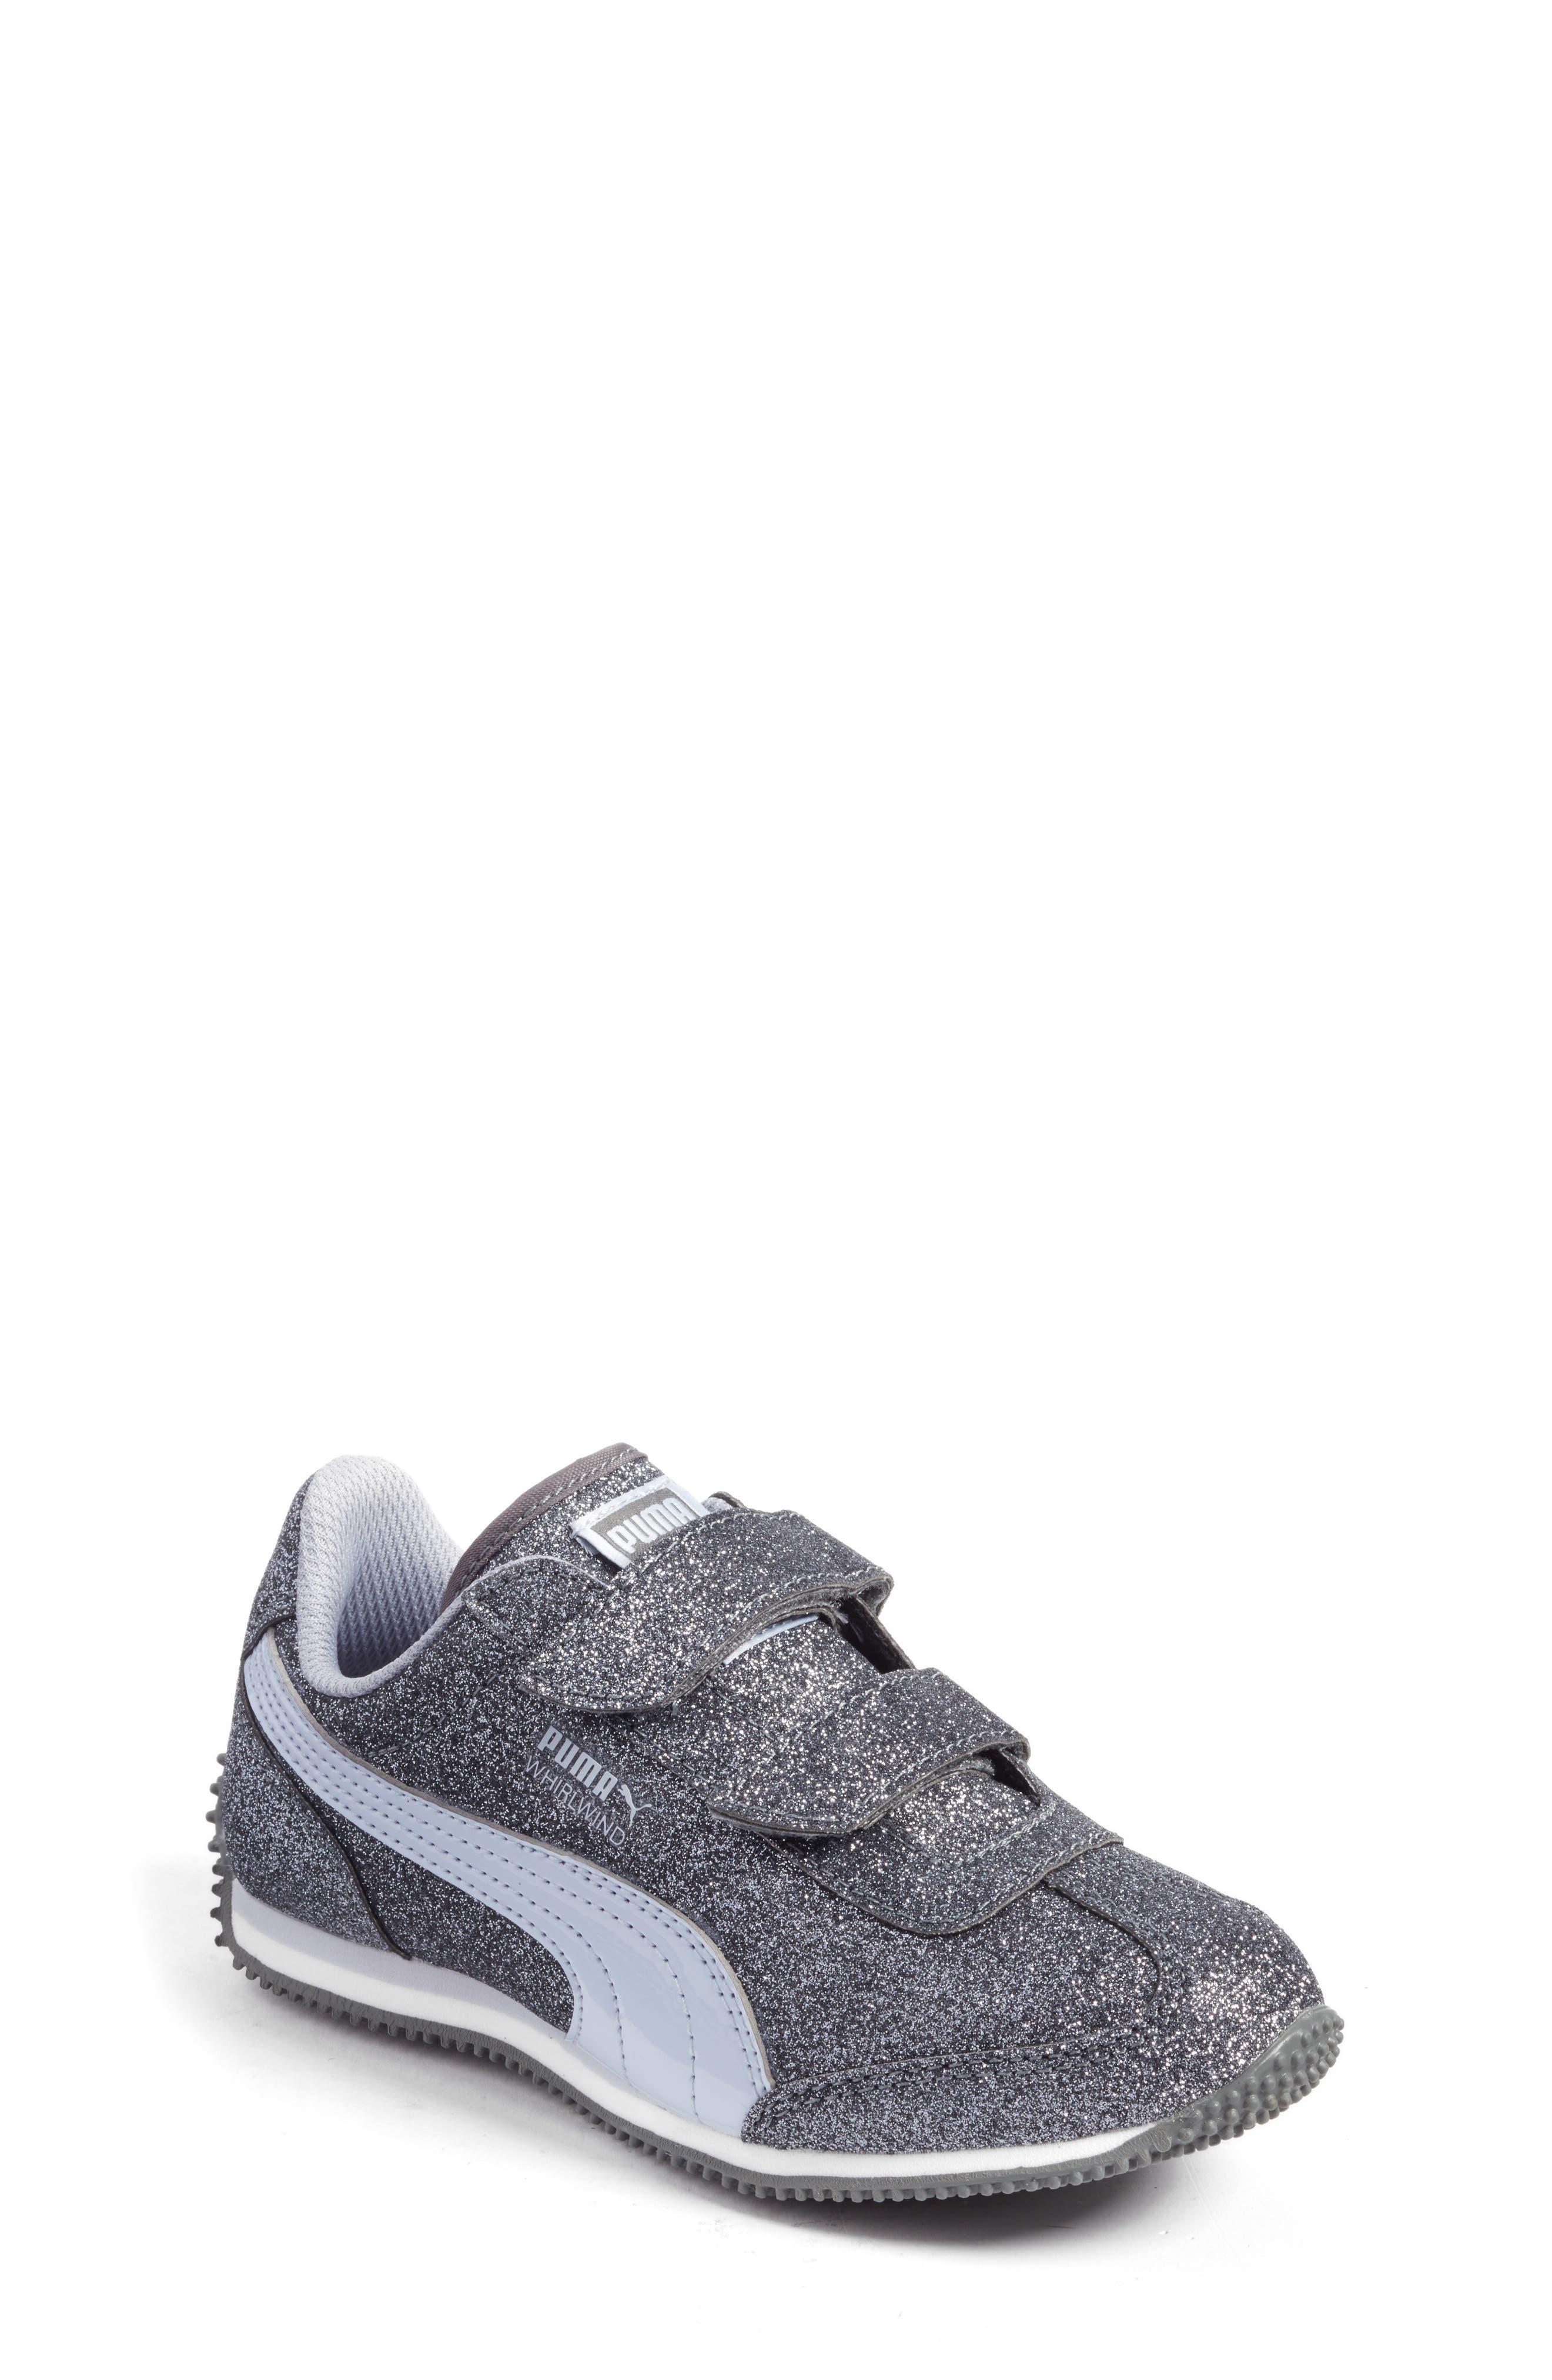 Whirlwind Glitz Sneaker,                             Main thumbnail 1, color,                             400